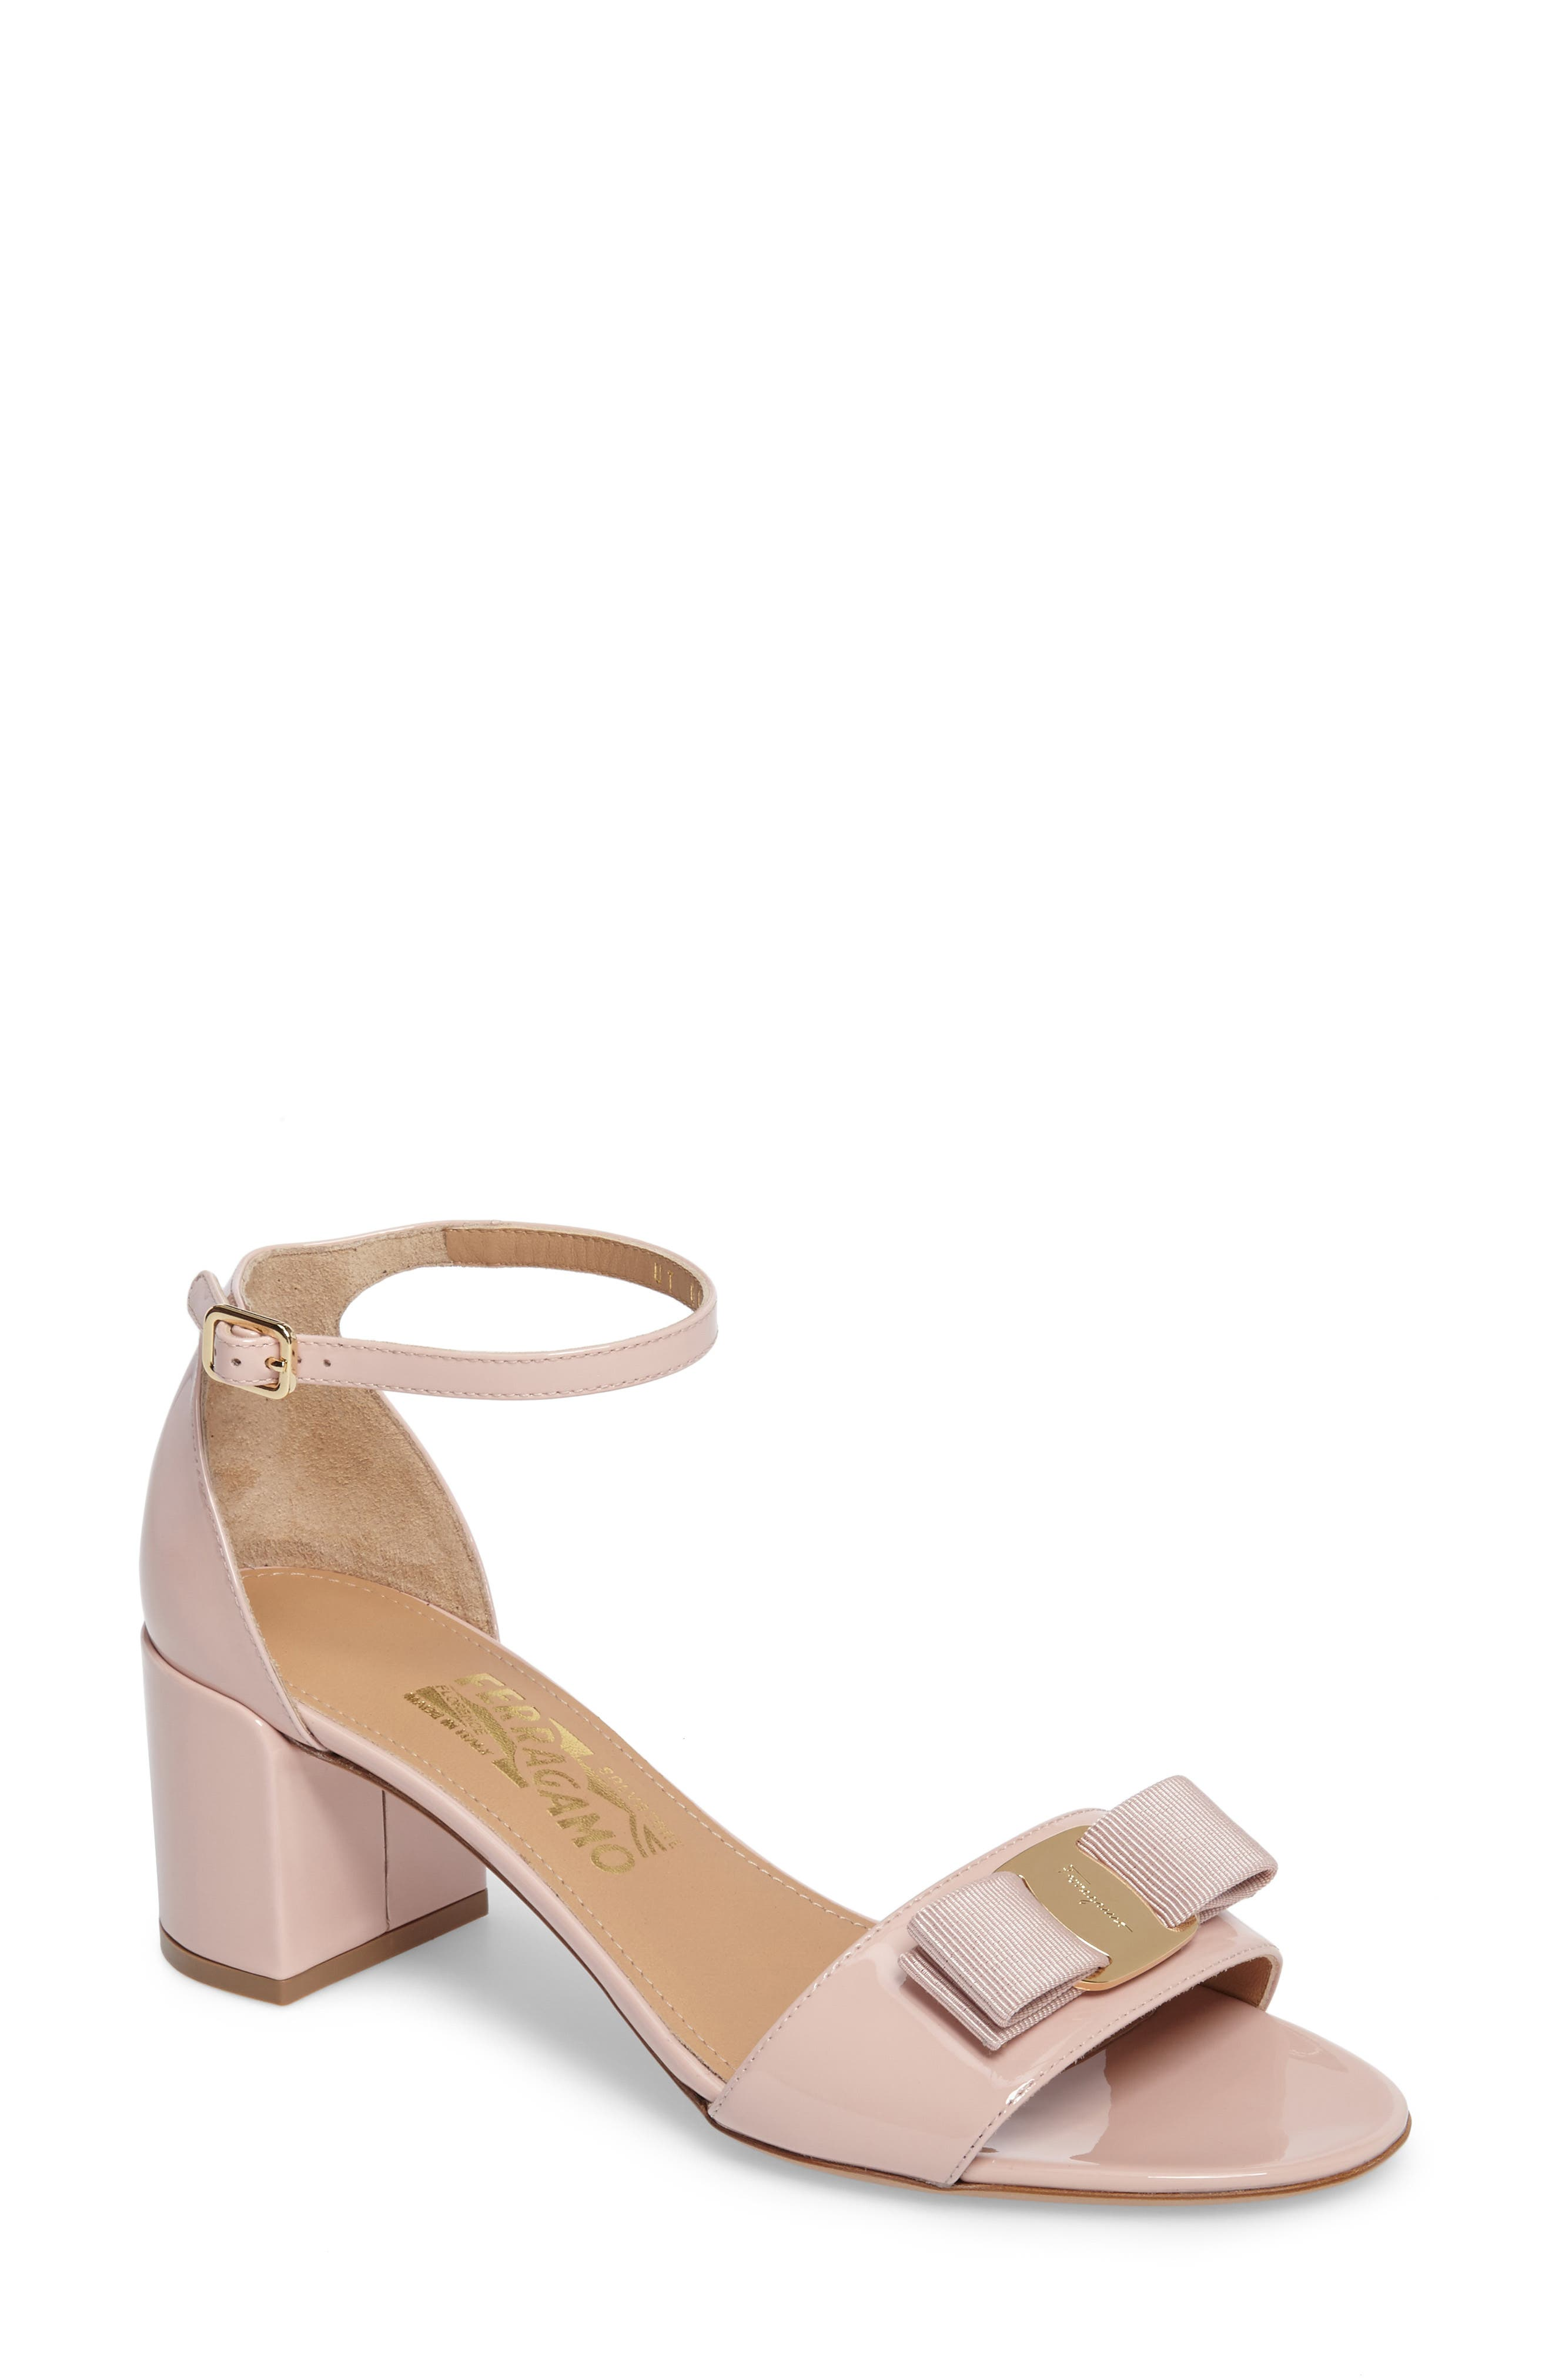 Gavina Ankle Strap Sandal,                             Main thumbnail 1, color,                             Bon Bon Pink